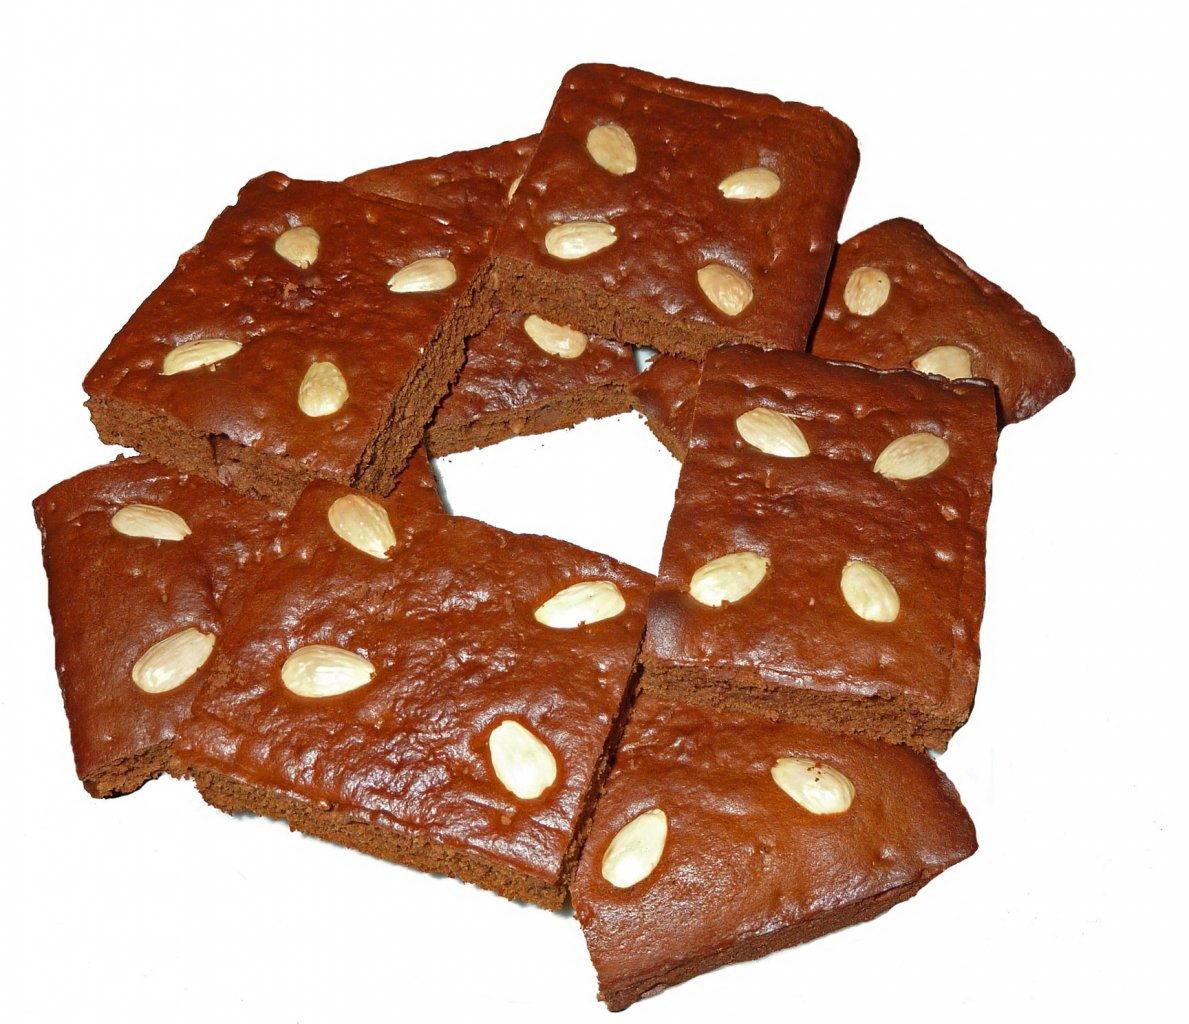 Honiglebkuchen - Gingerbread